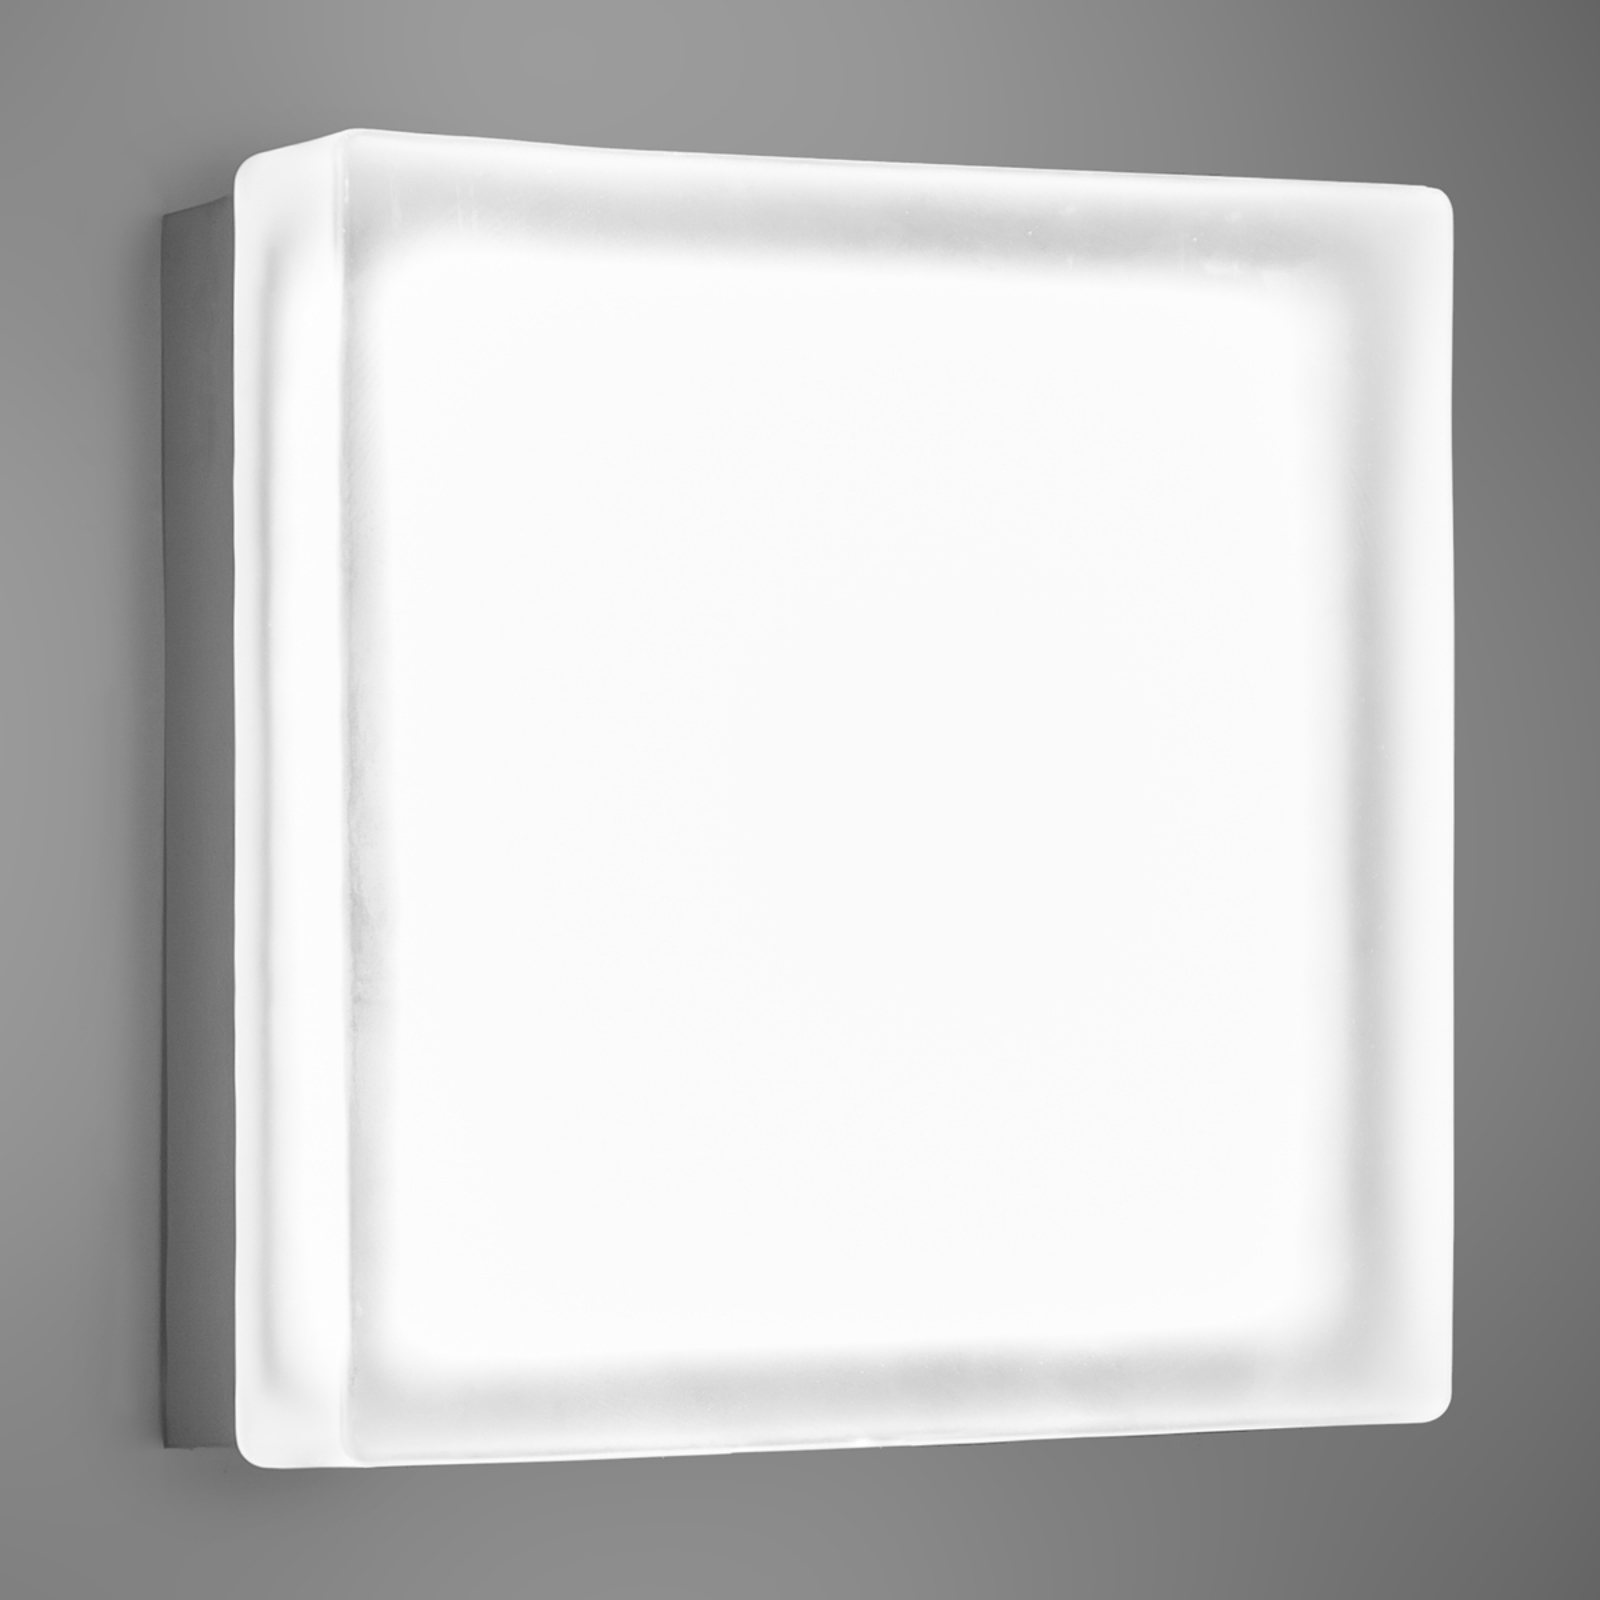 Vierkante led wandlamp Briq 02 universeel wit